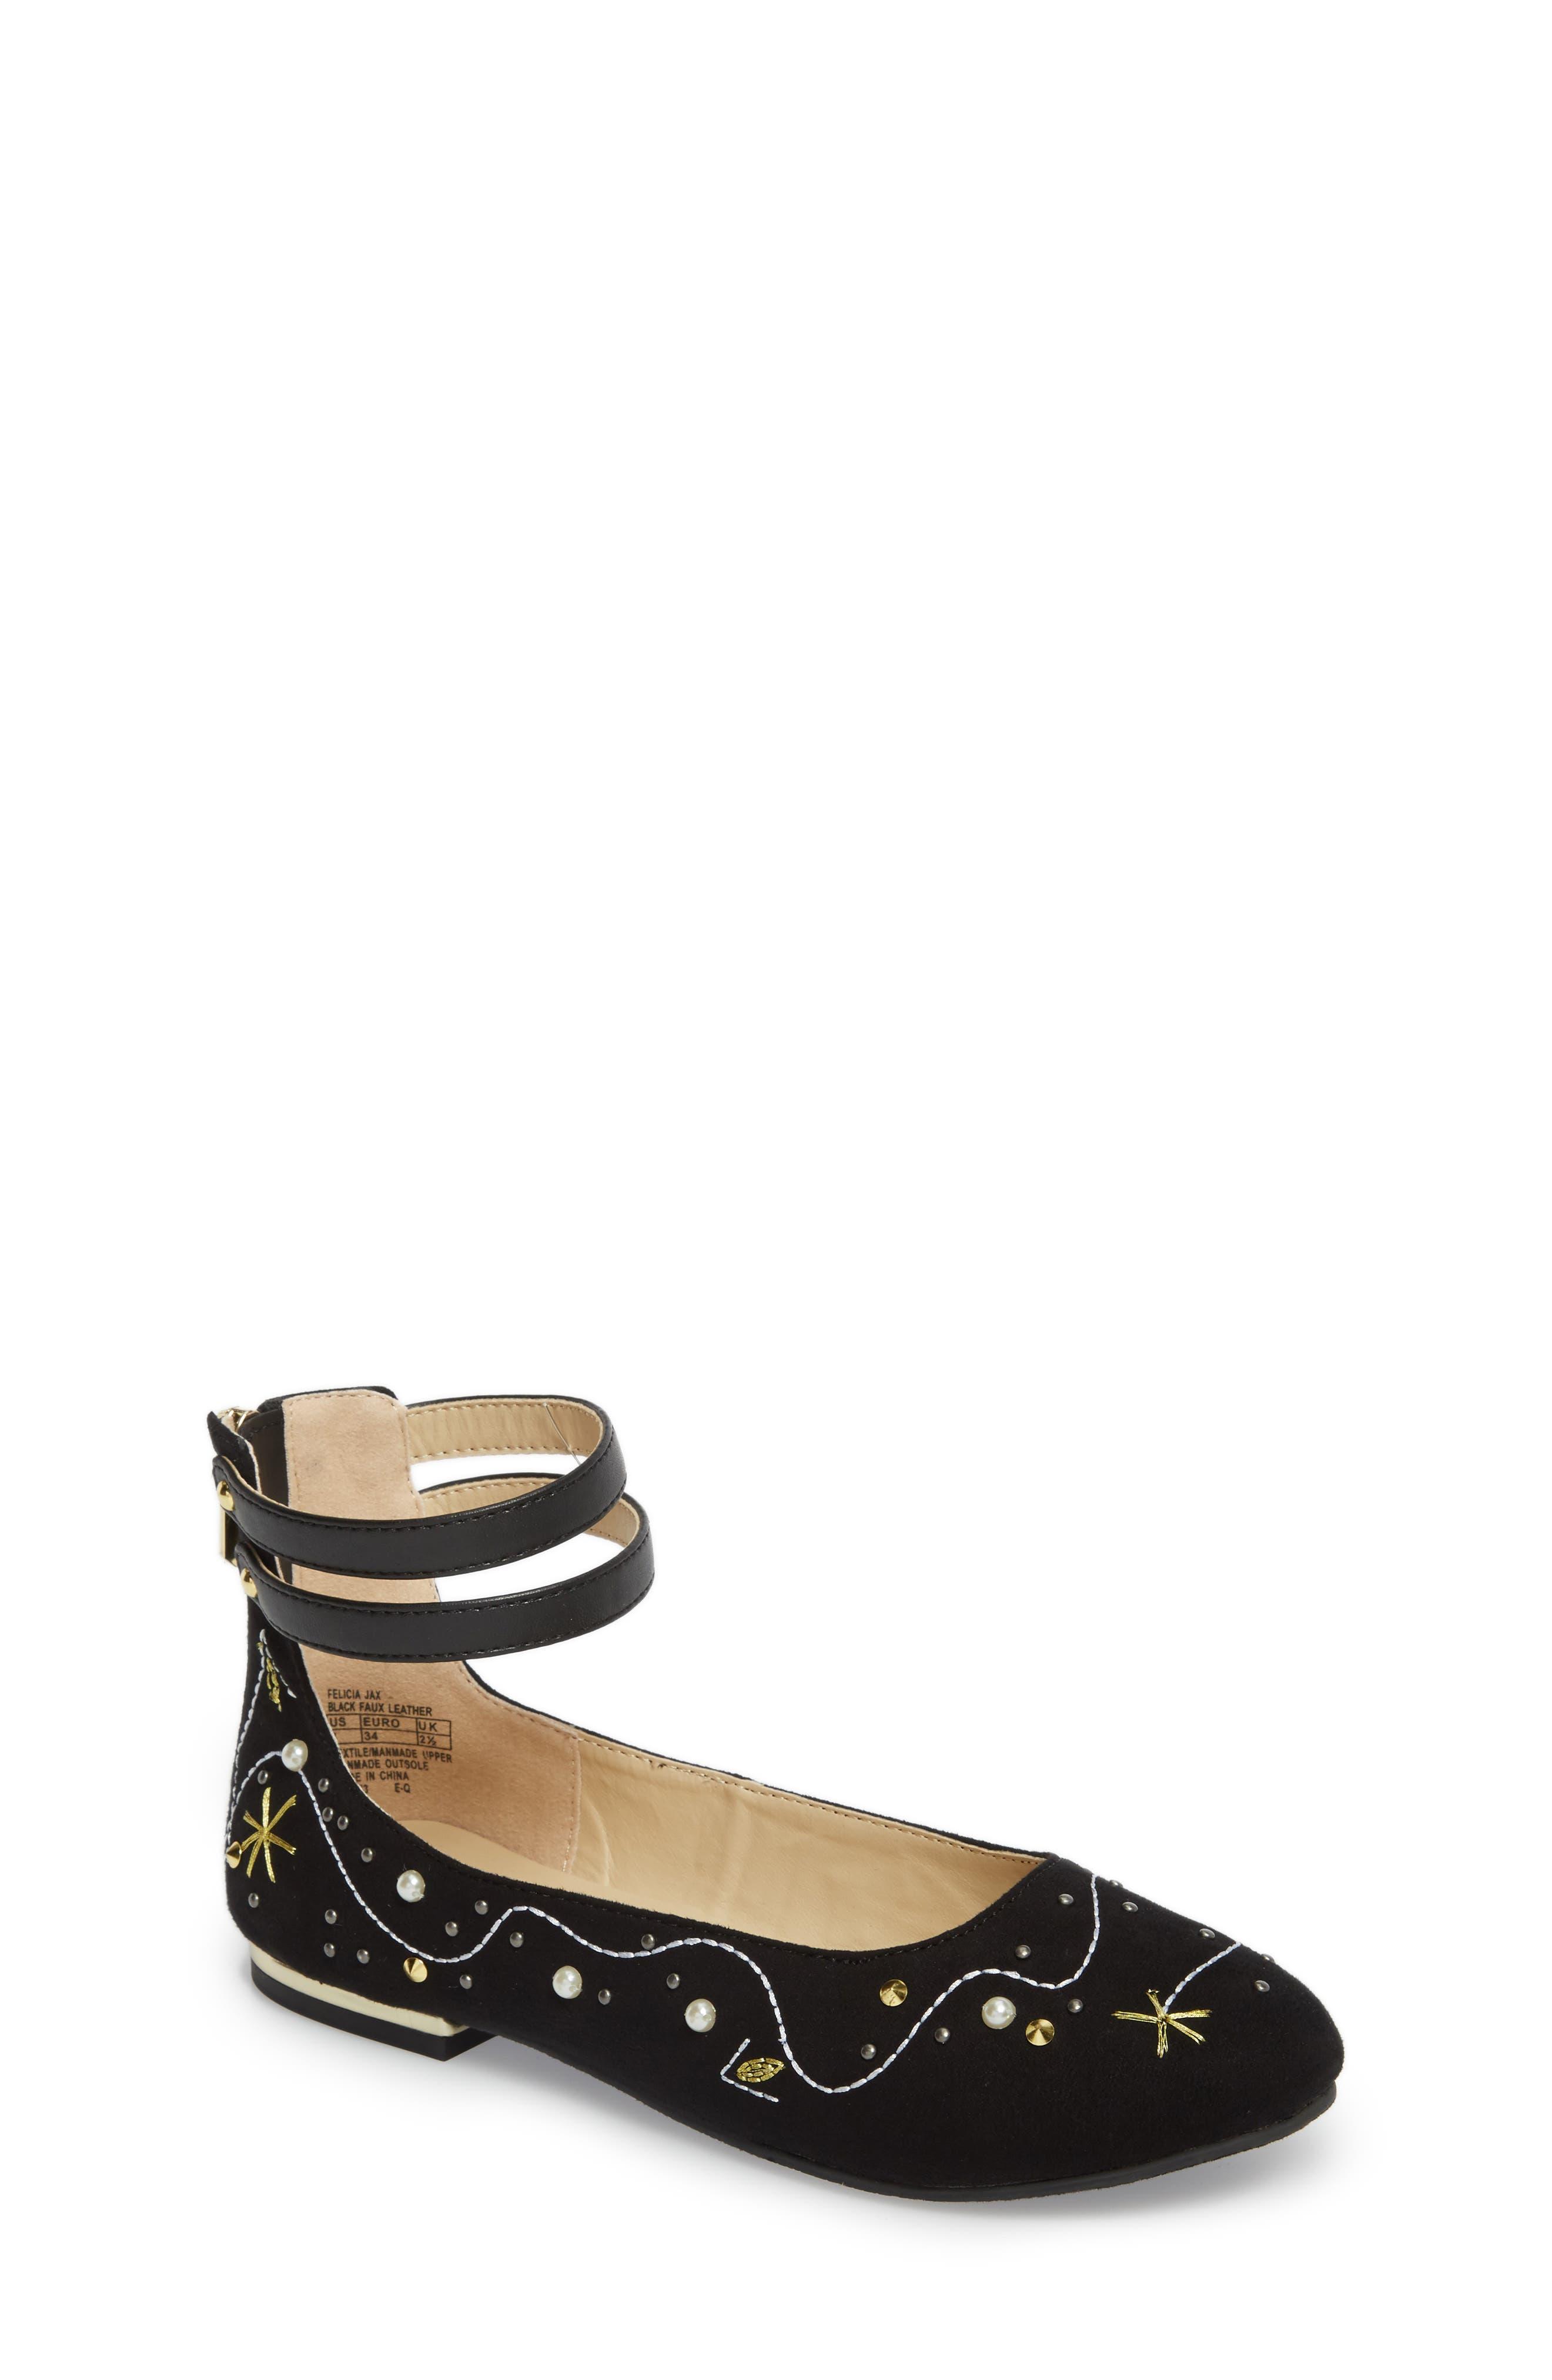 Felicia Jax Embellished Flat,                         Main,                         color, Black